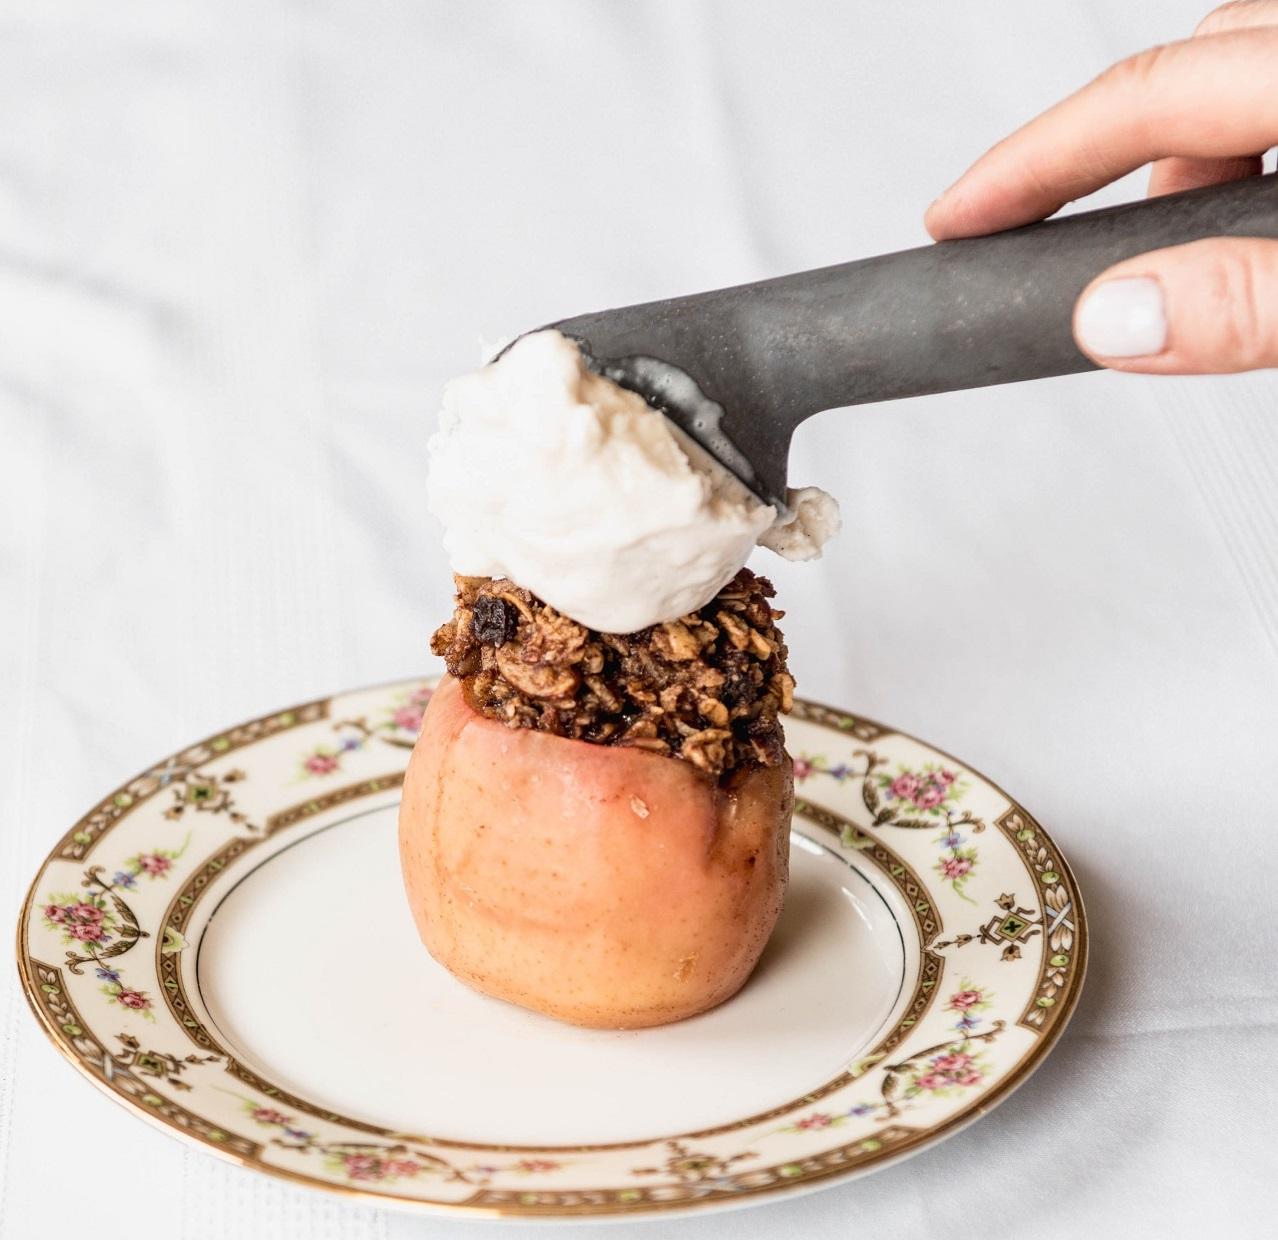 baked-apple-ice-cream.jpg